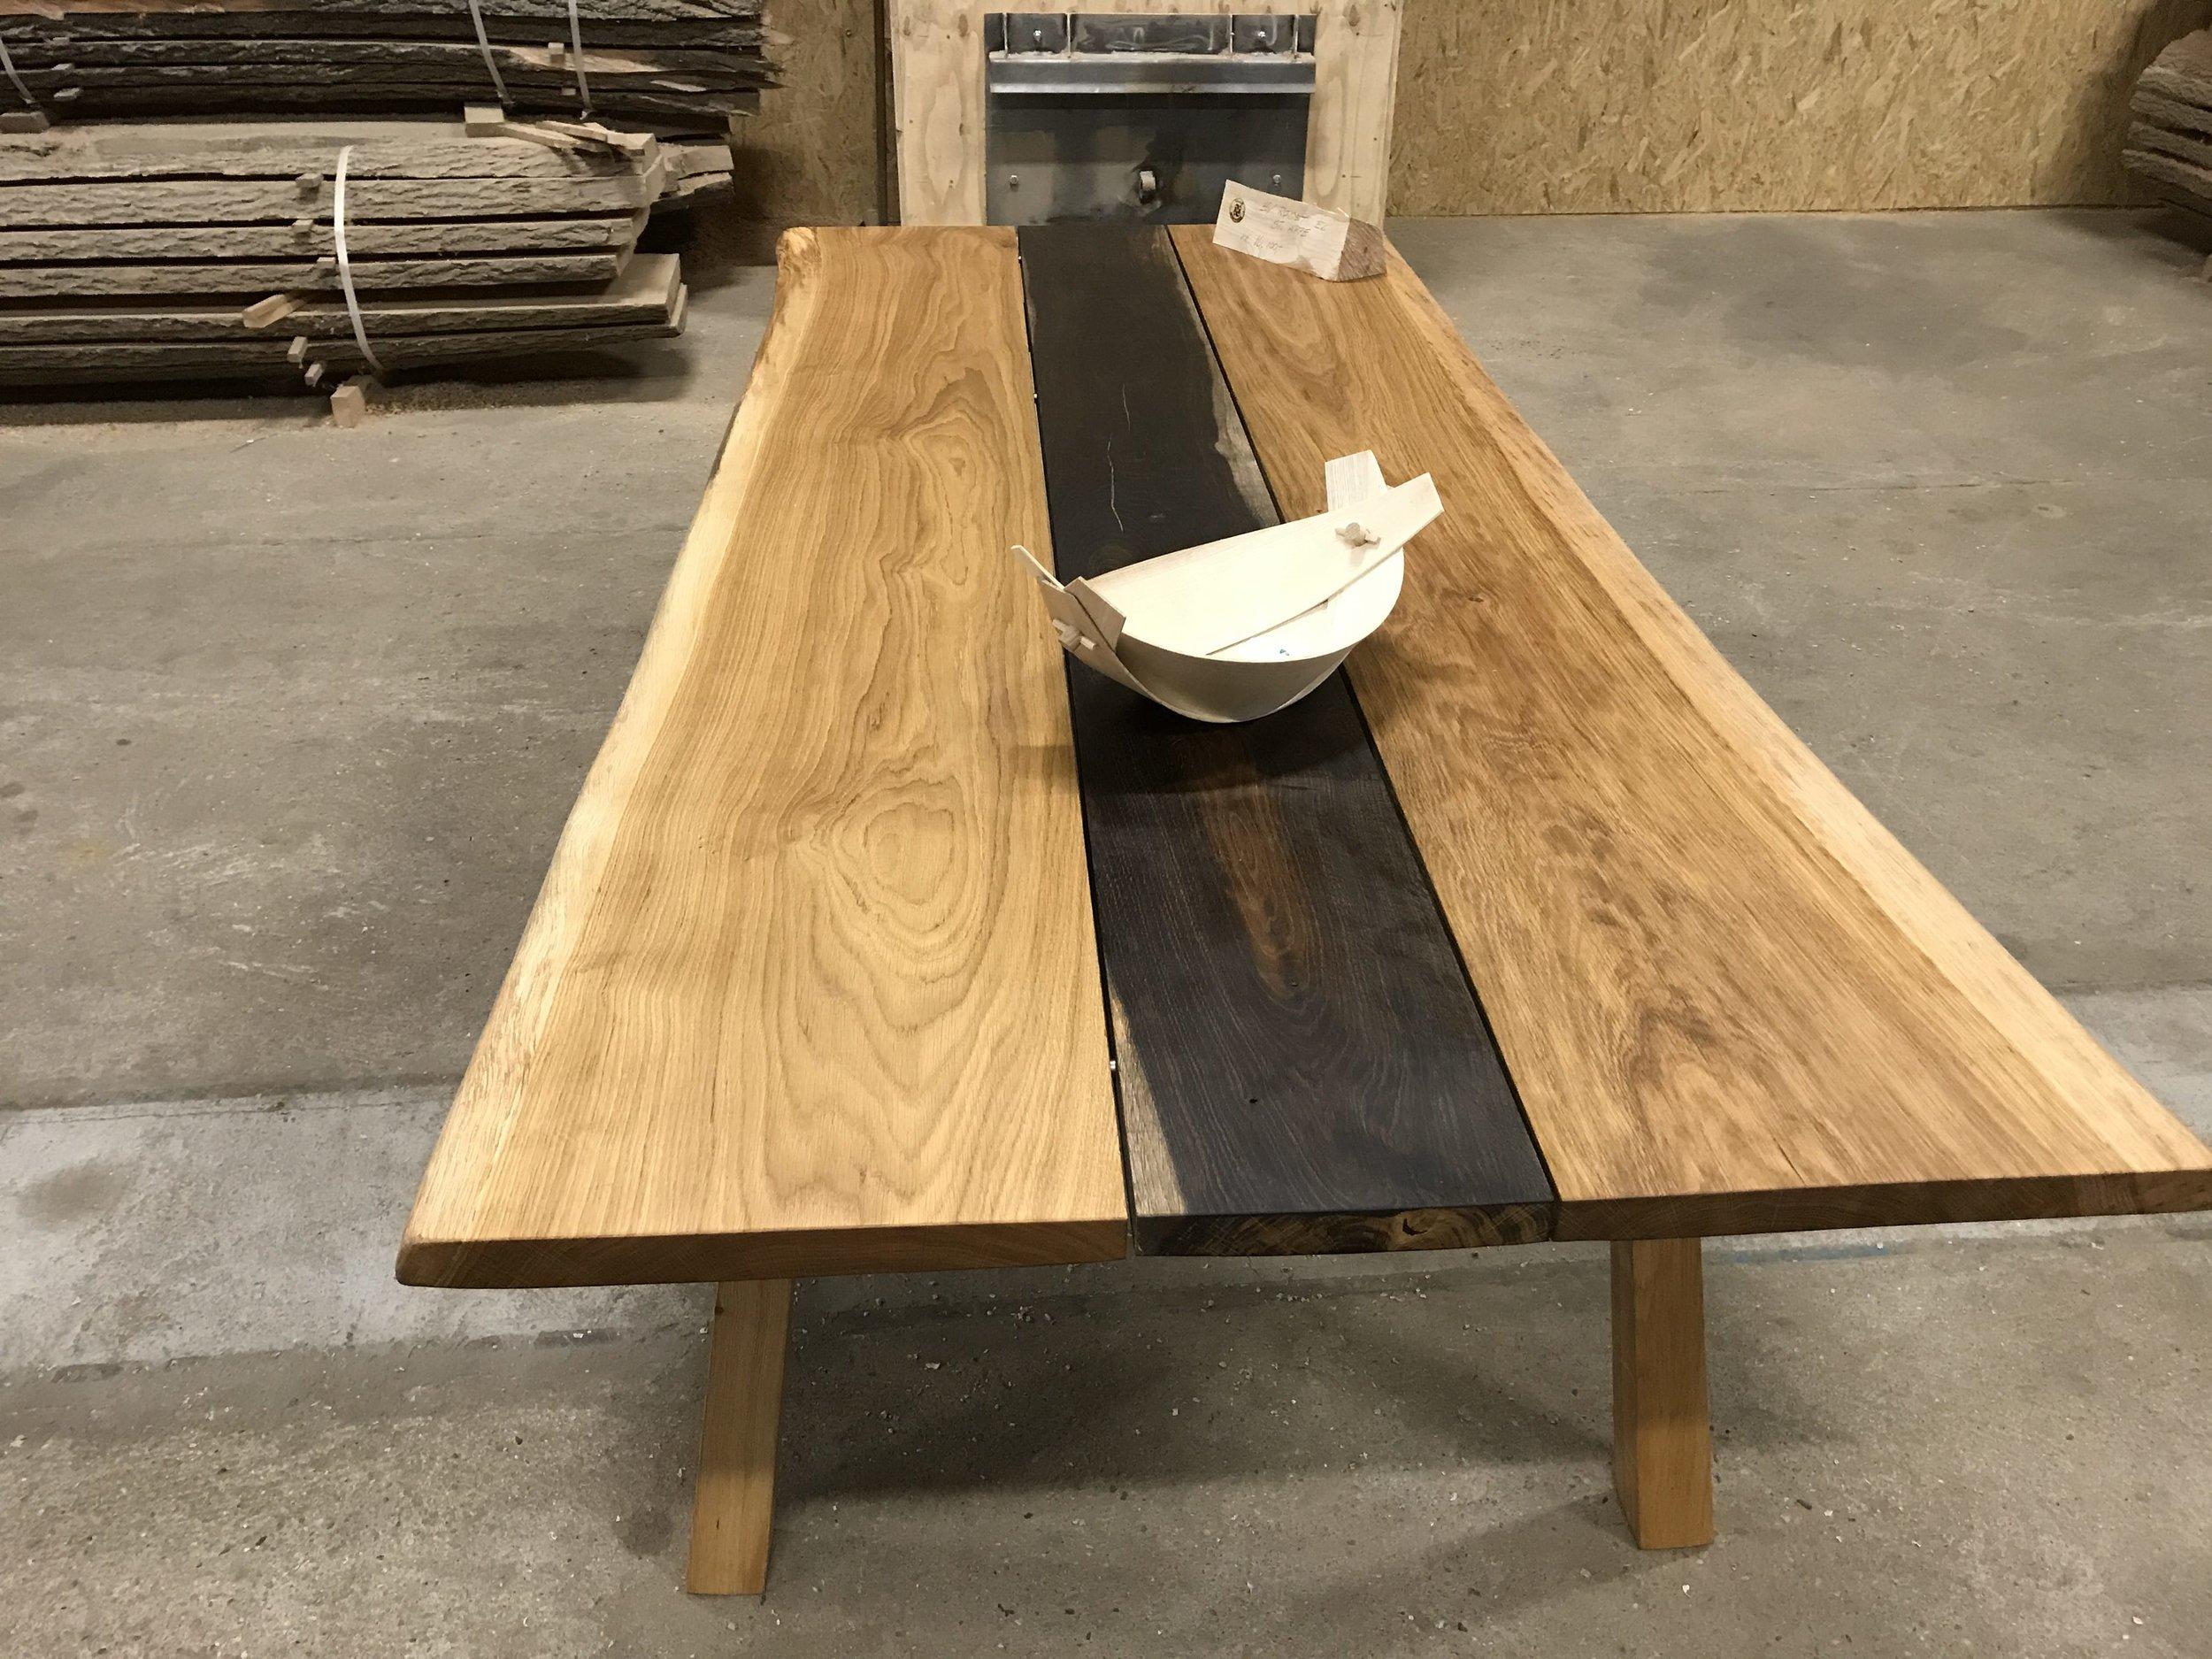 2-tone-table-min.jpg